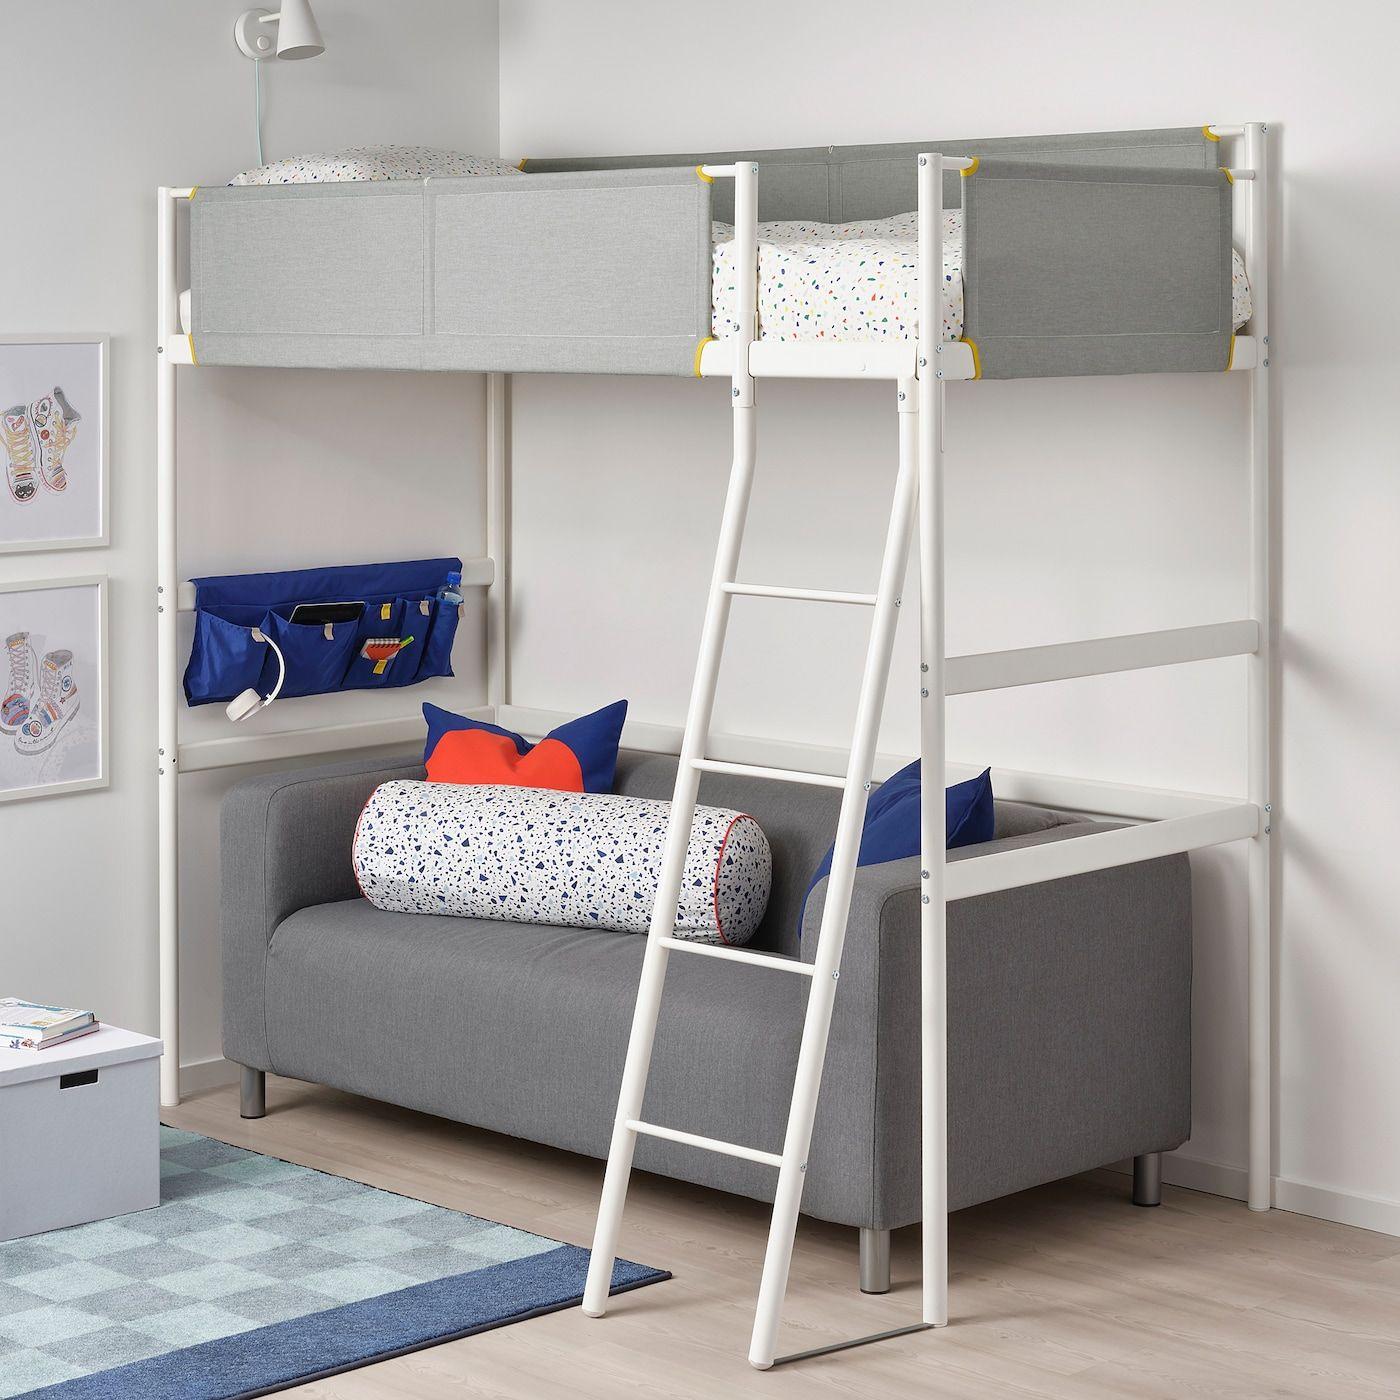 Vitval Hochbettgestell Weiss Hellgrau Ikea Osterreich Loft Bed Frame Loft Bed Bed Frame